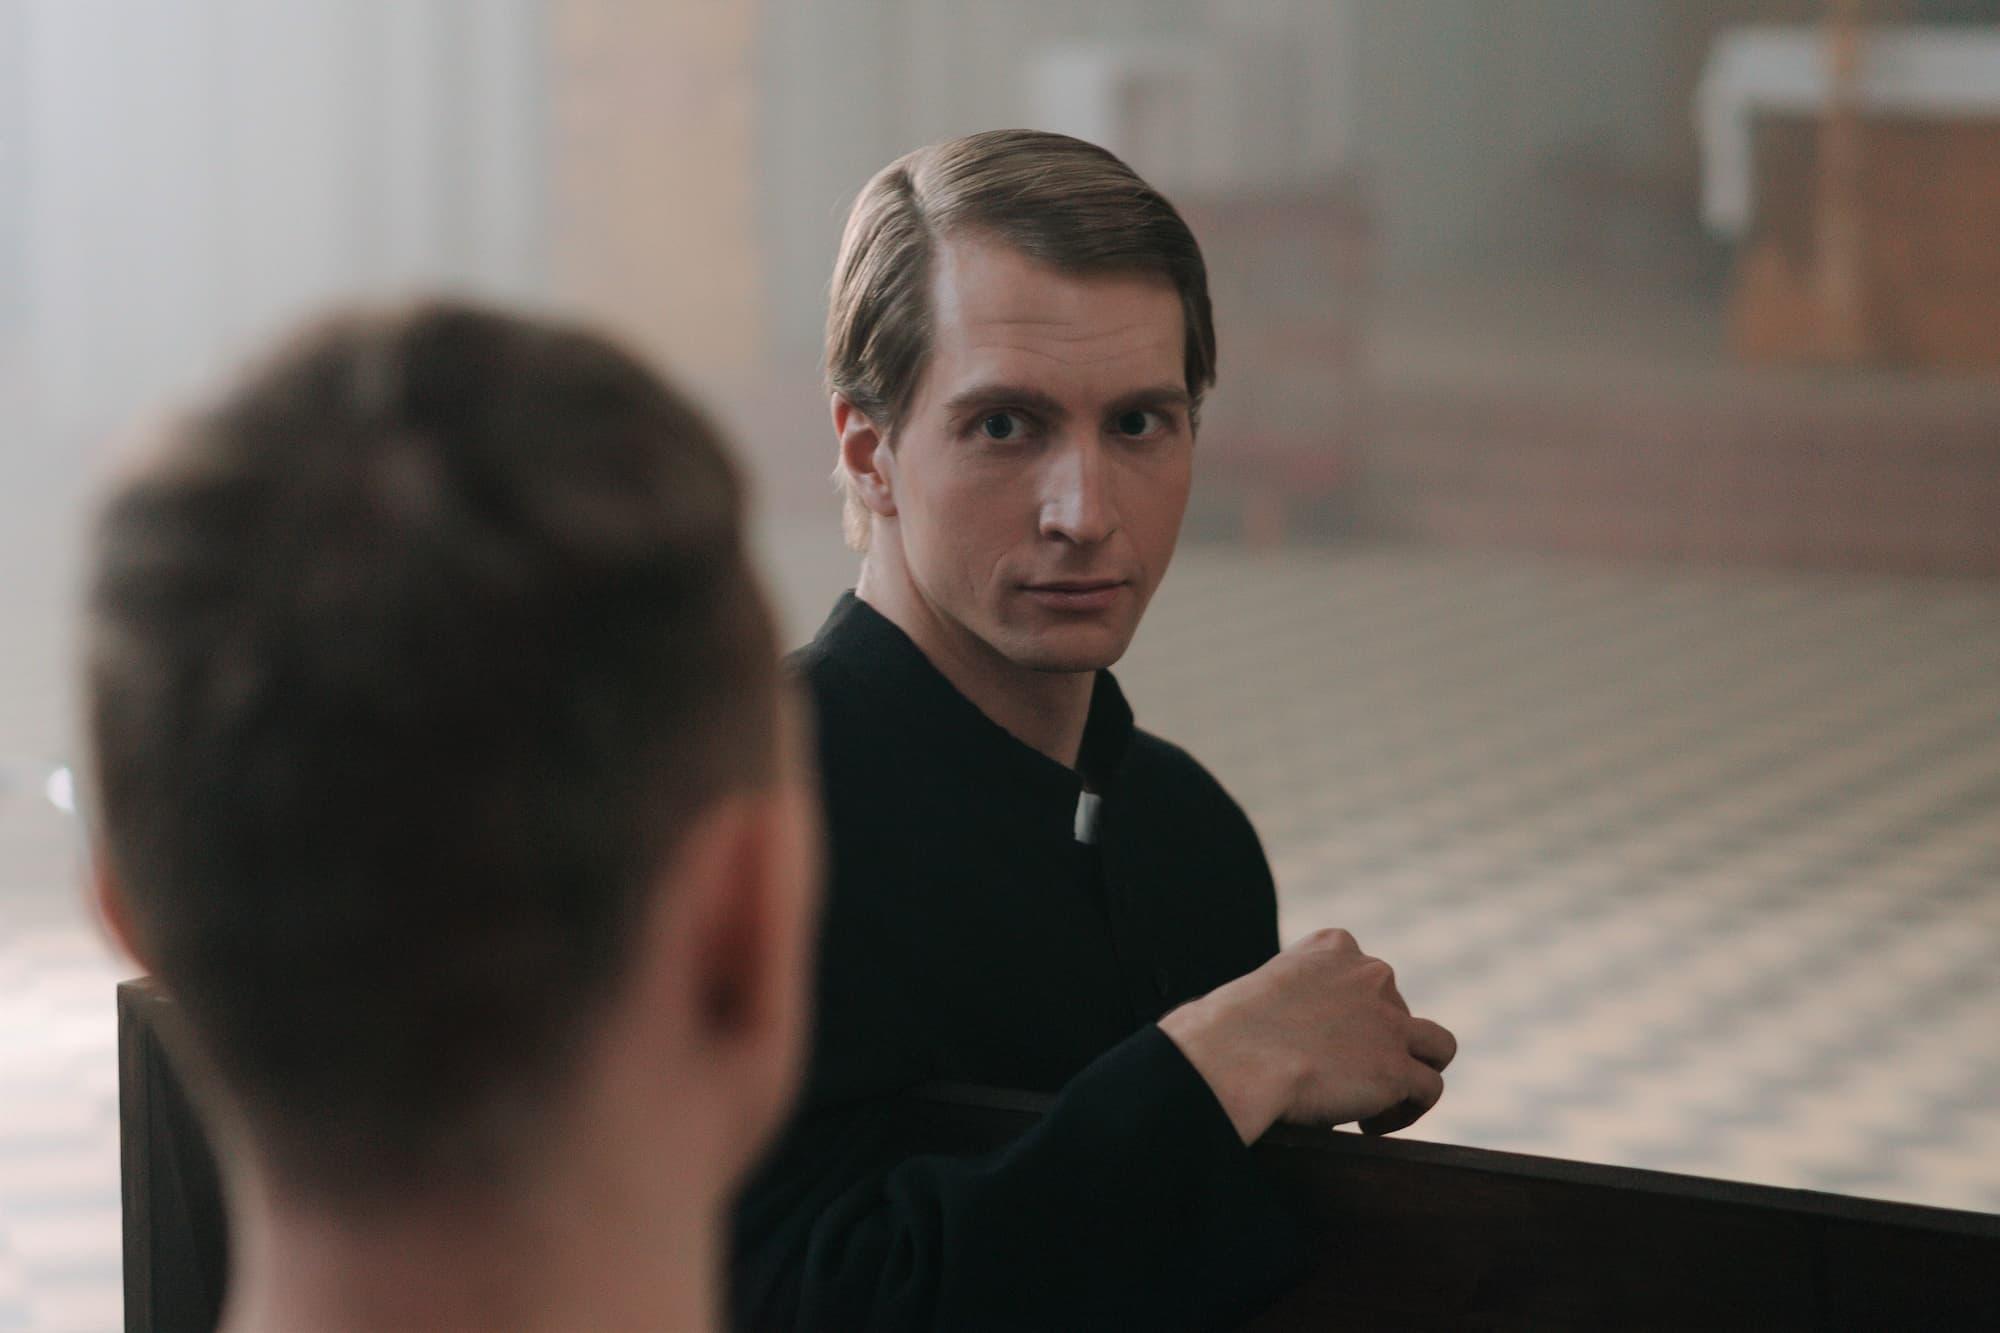 priest, church